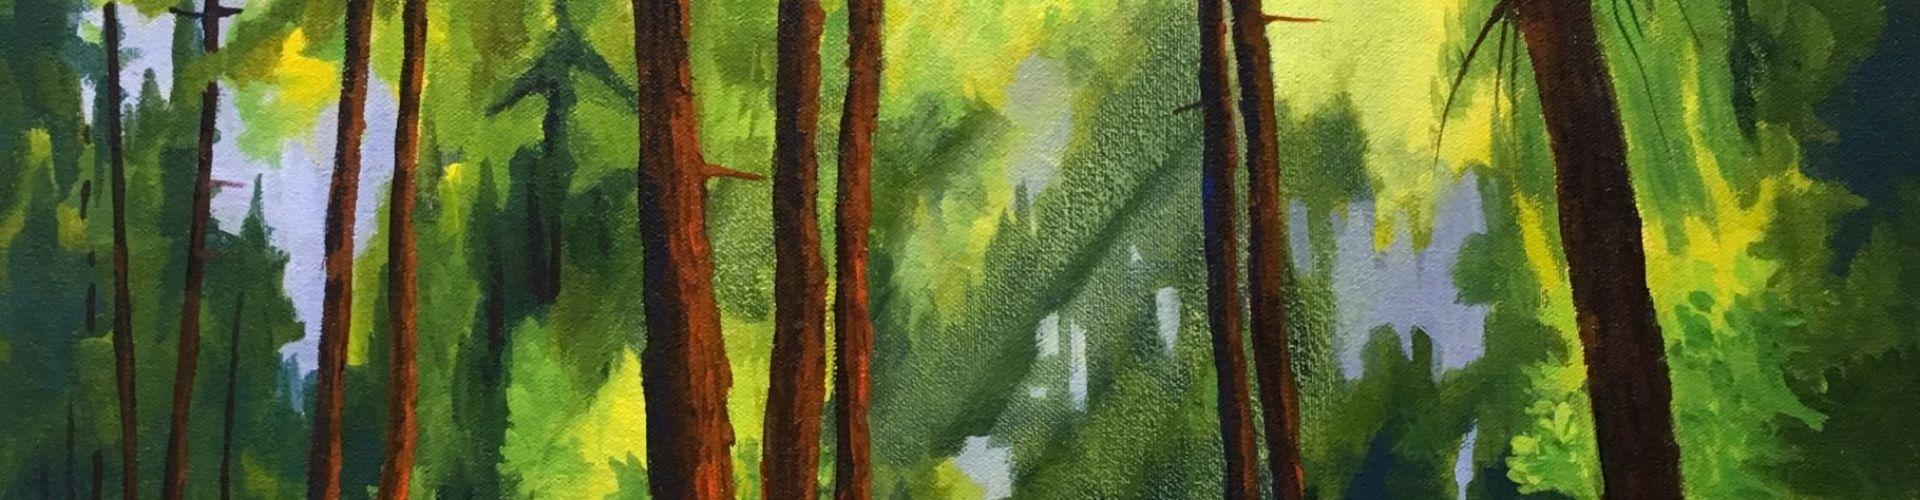 Dreamland painting by Linda Lovisa